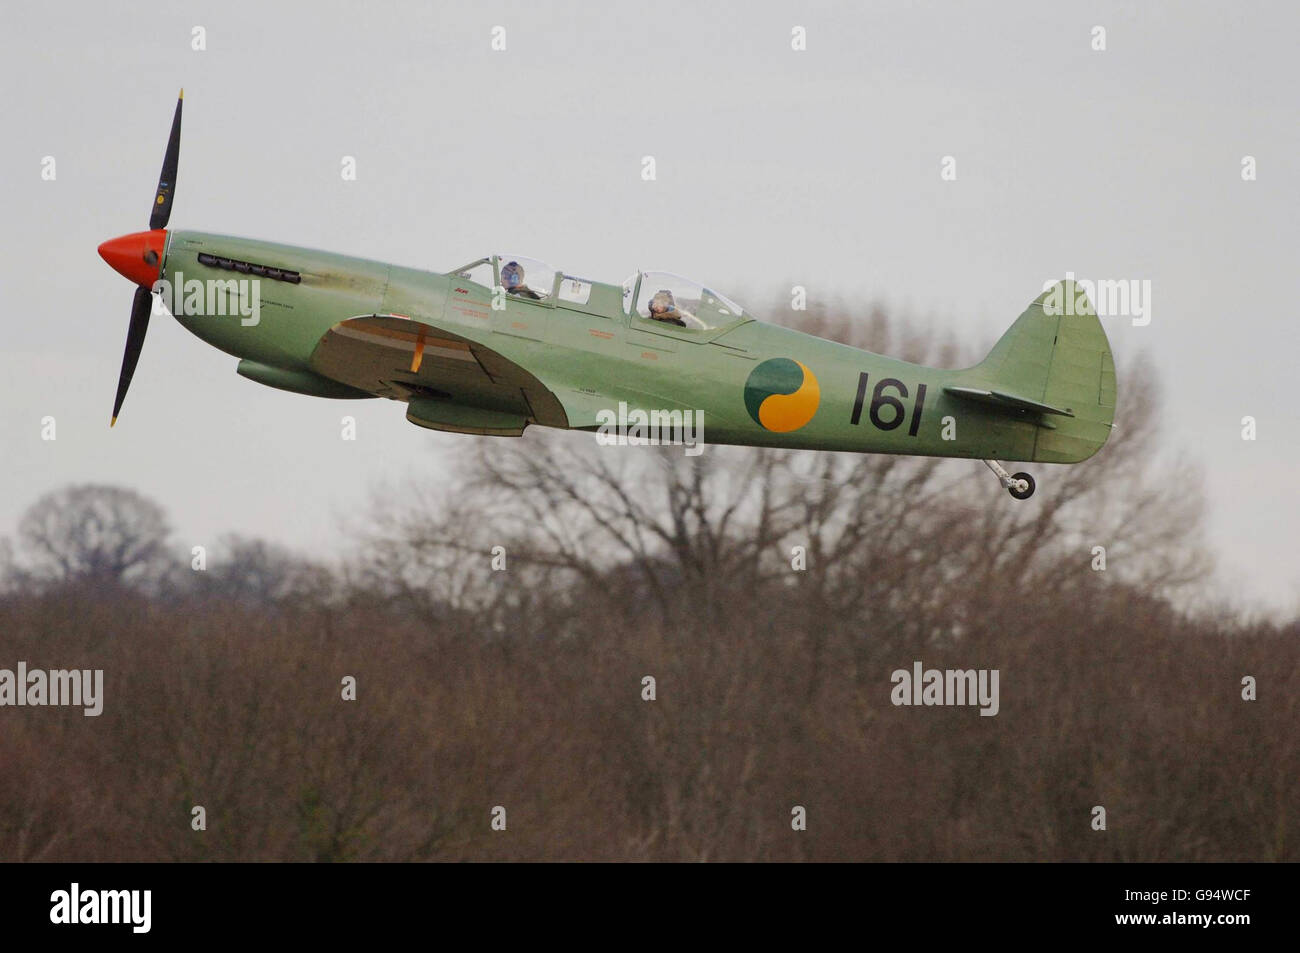 HERITAGE Spitfire - Stock Image